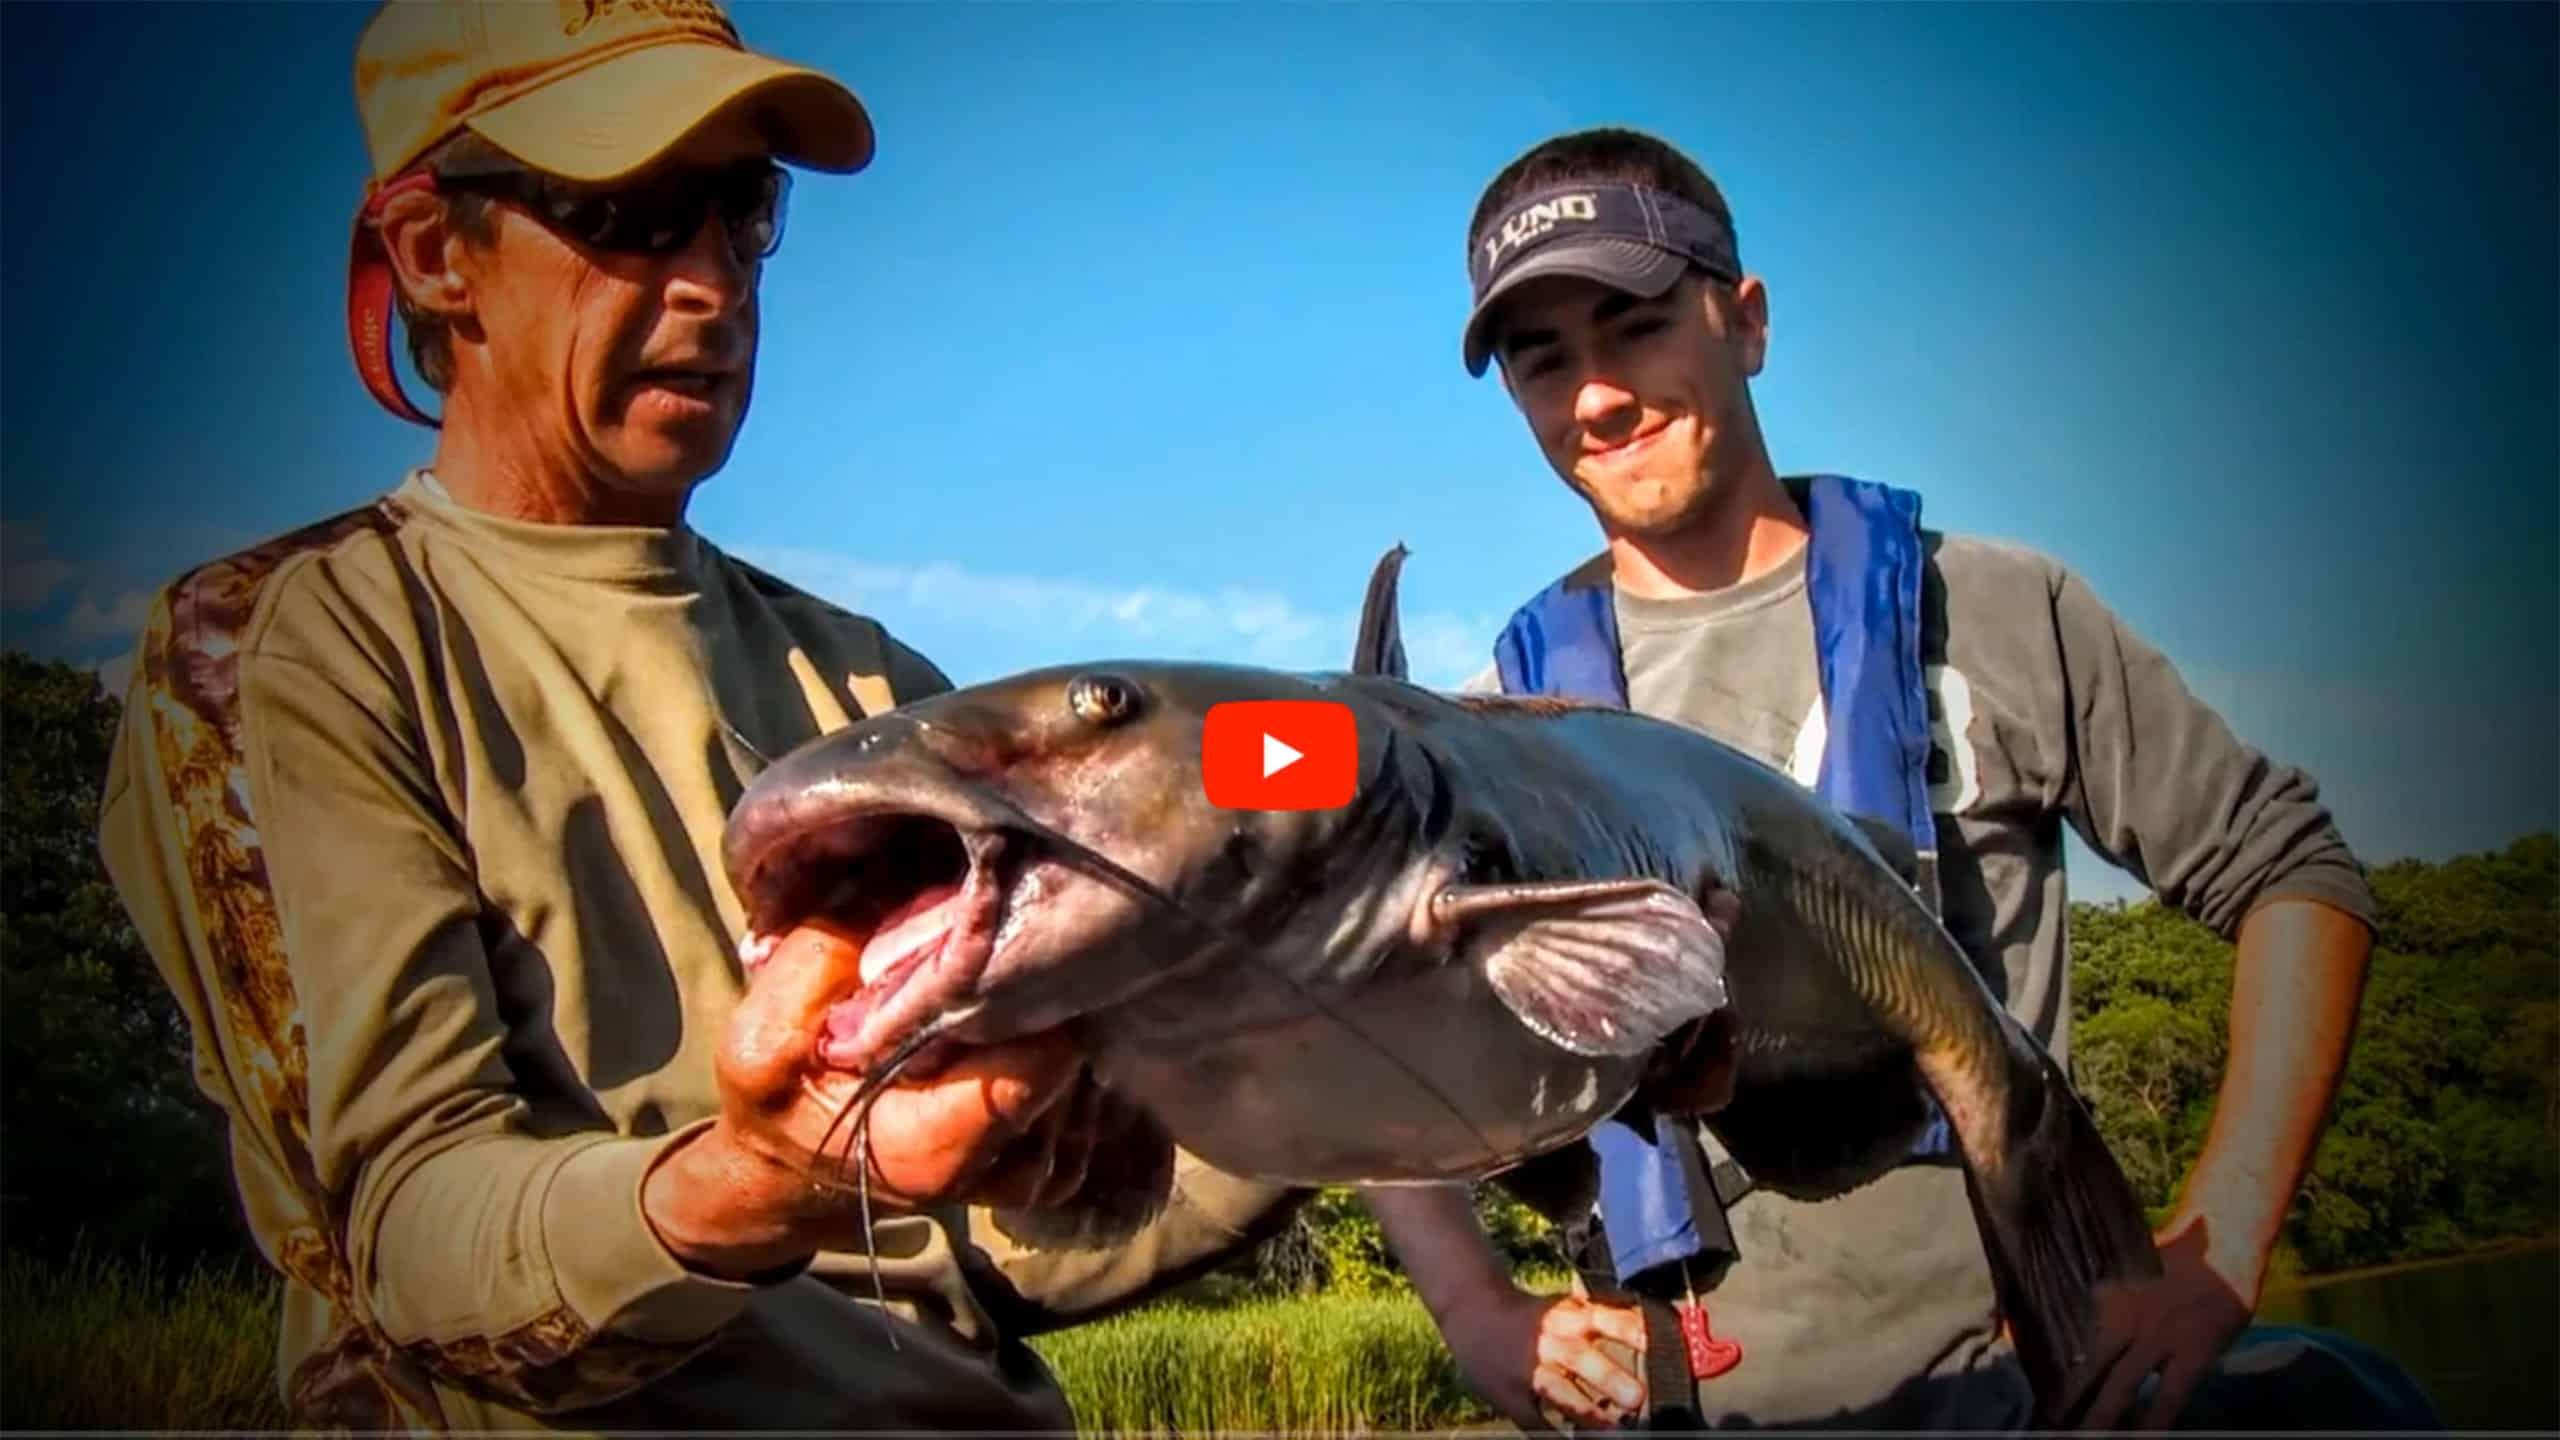 river catfish